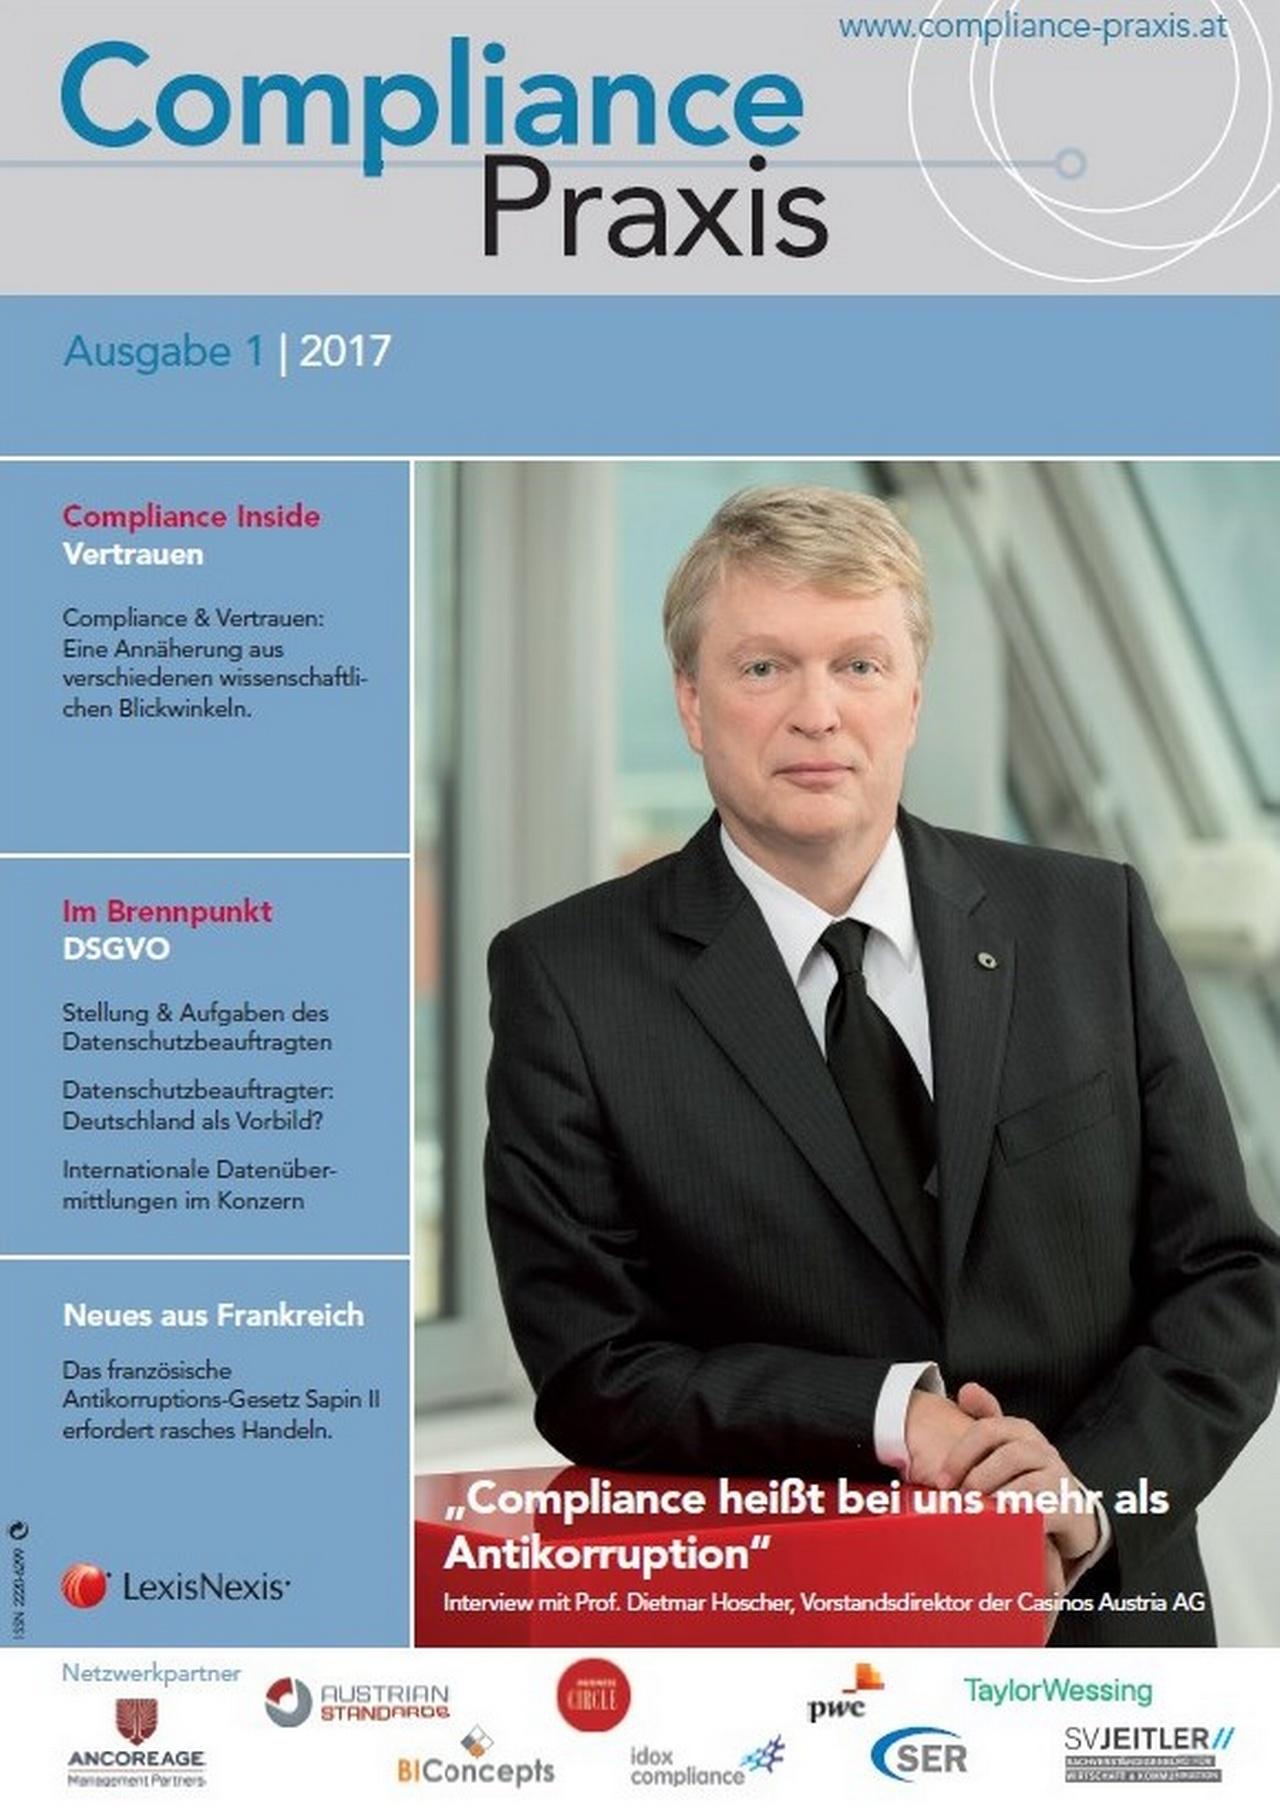 Cover von Compliance Praxis Ausgabe 1/2017, © LexisNexis